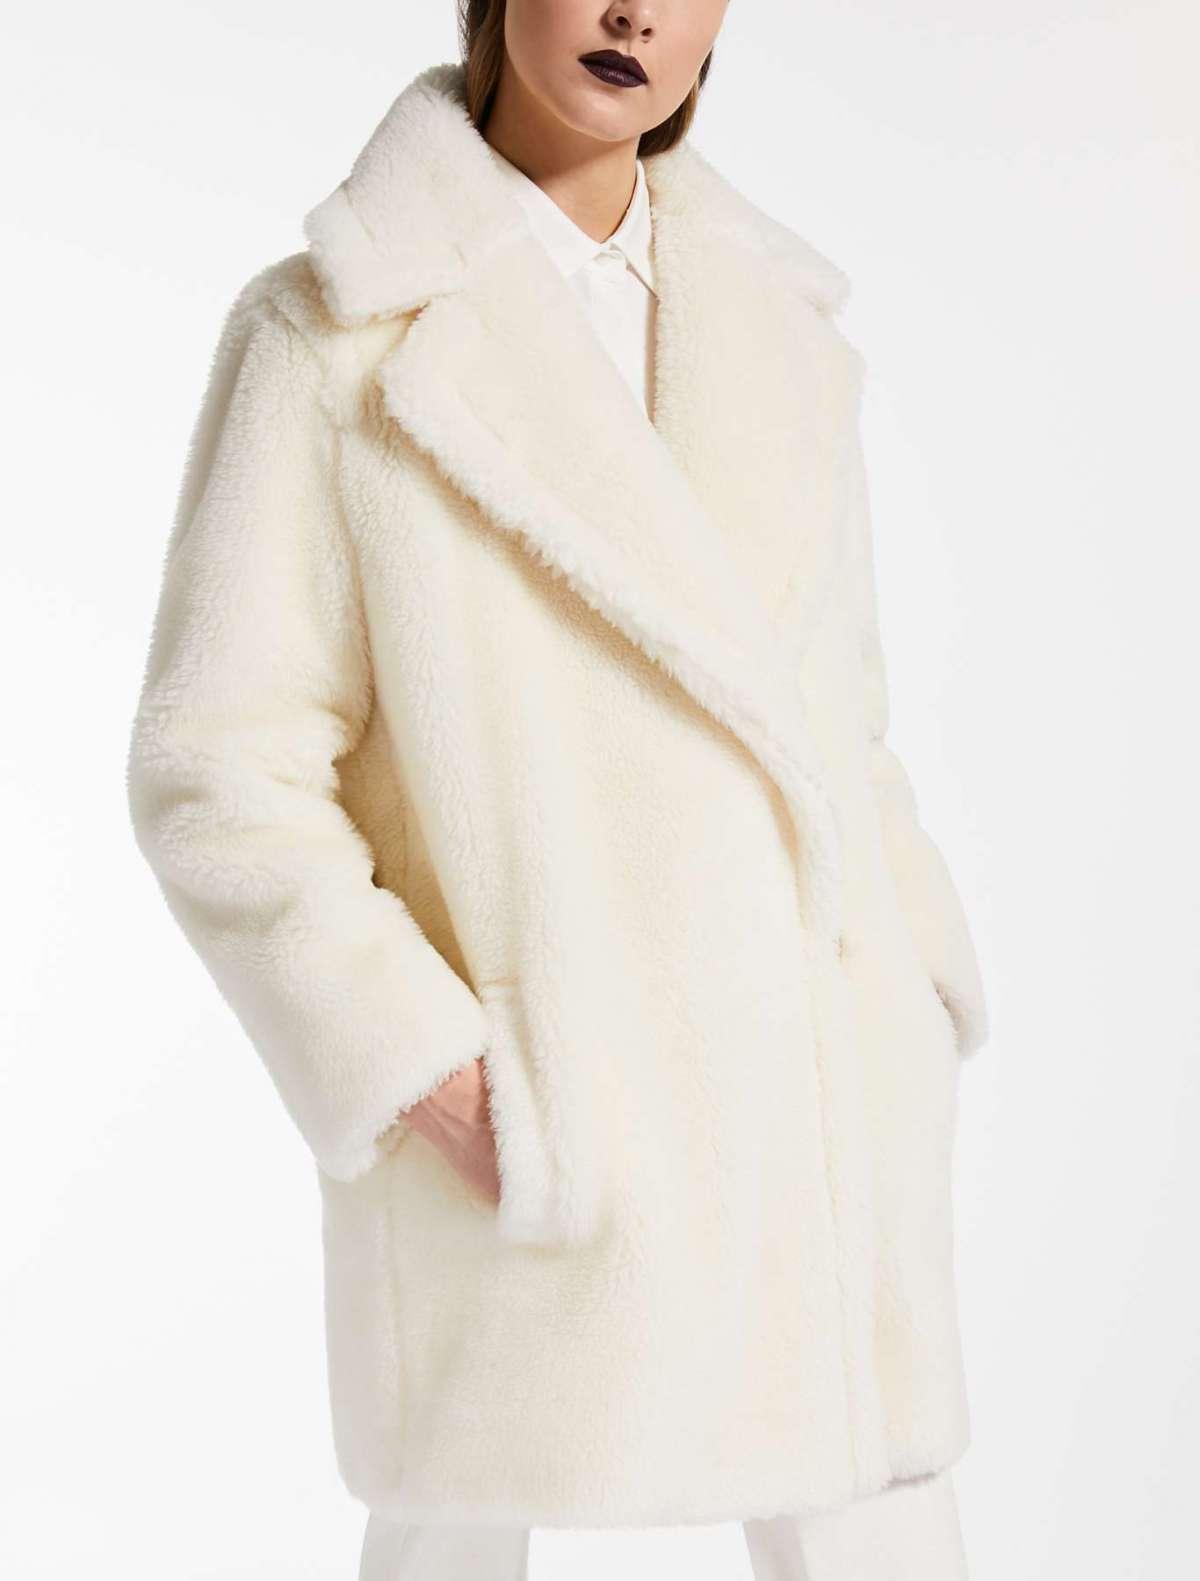 Cappotto teddy bear coat Max Mara a 1100 euro